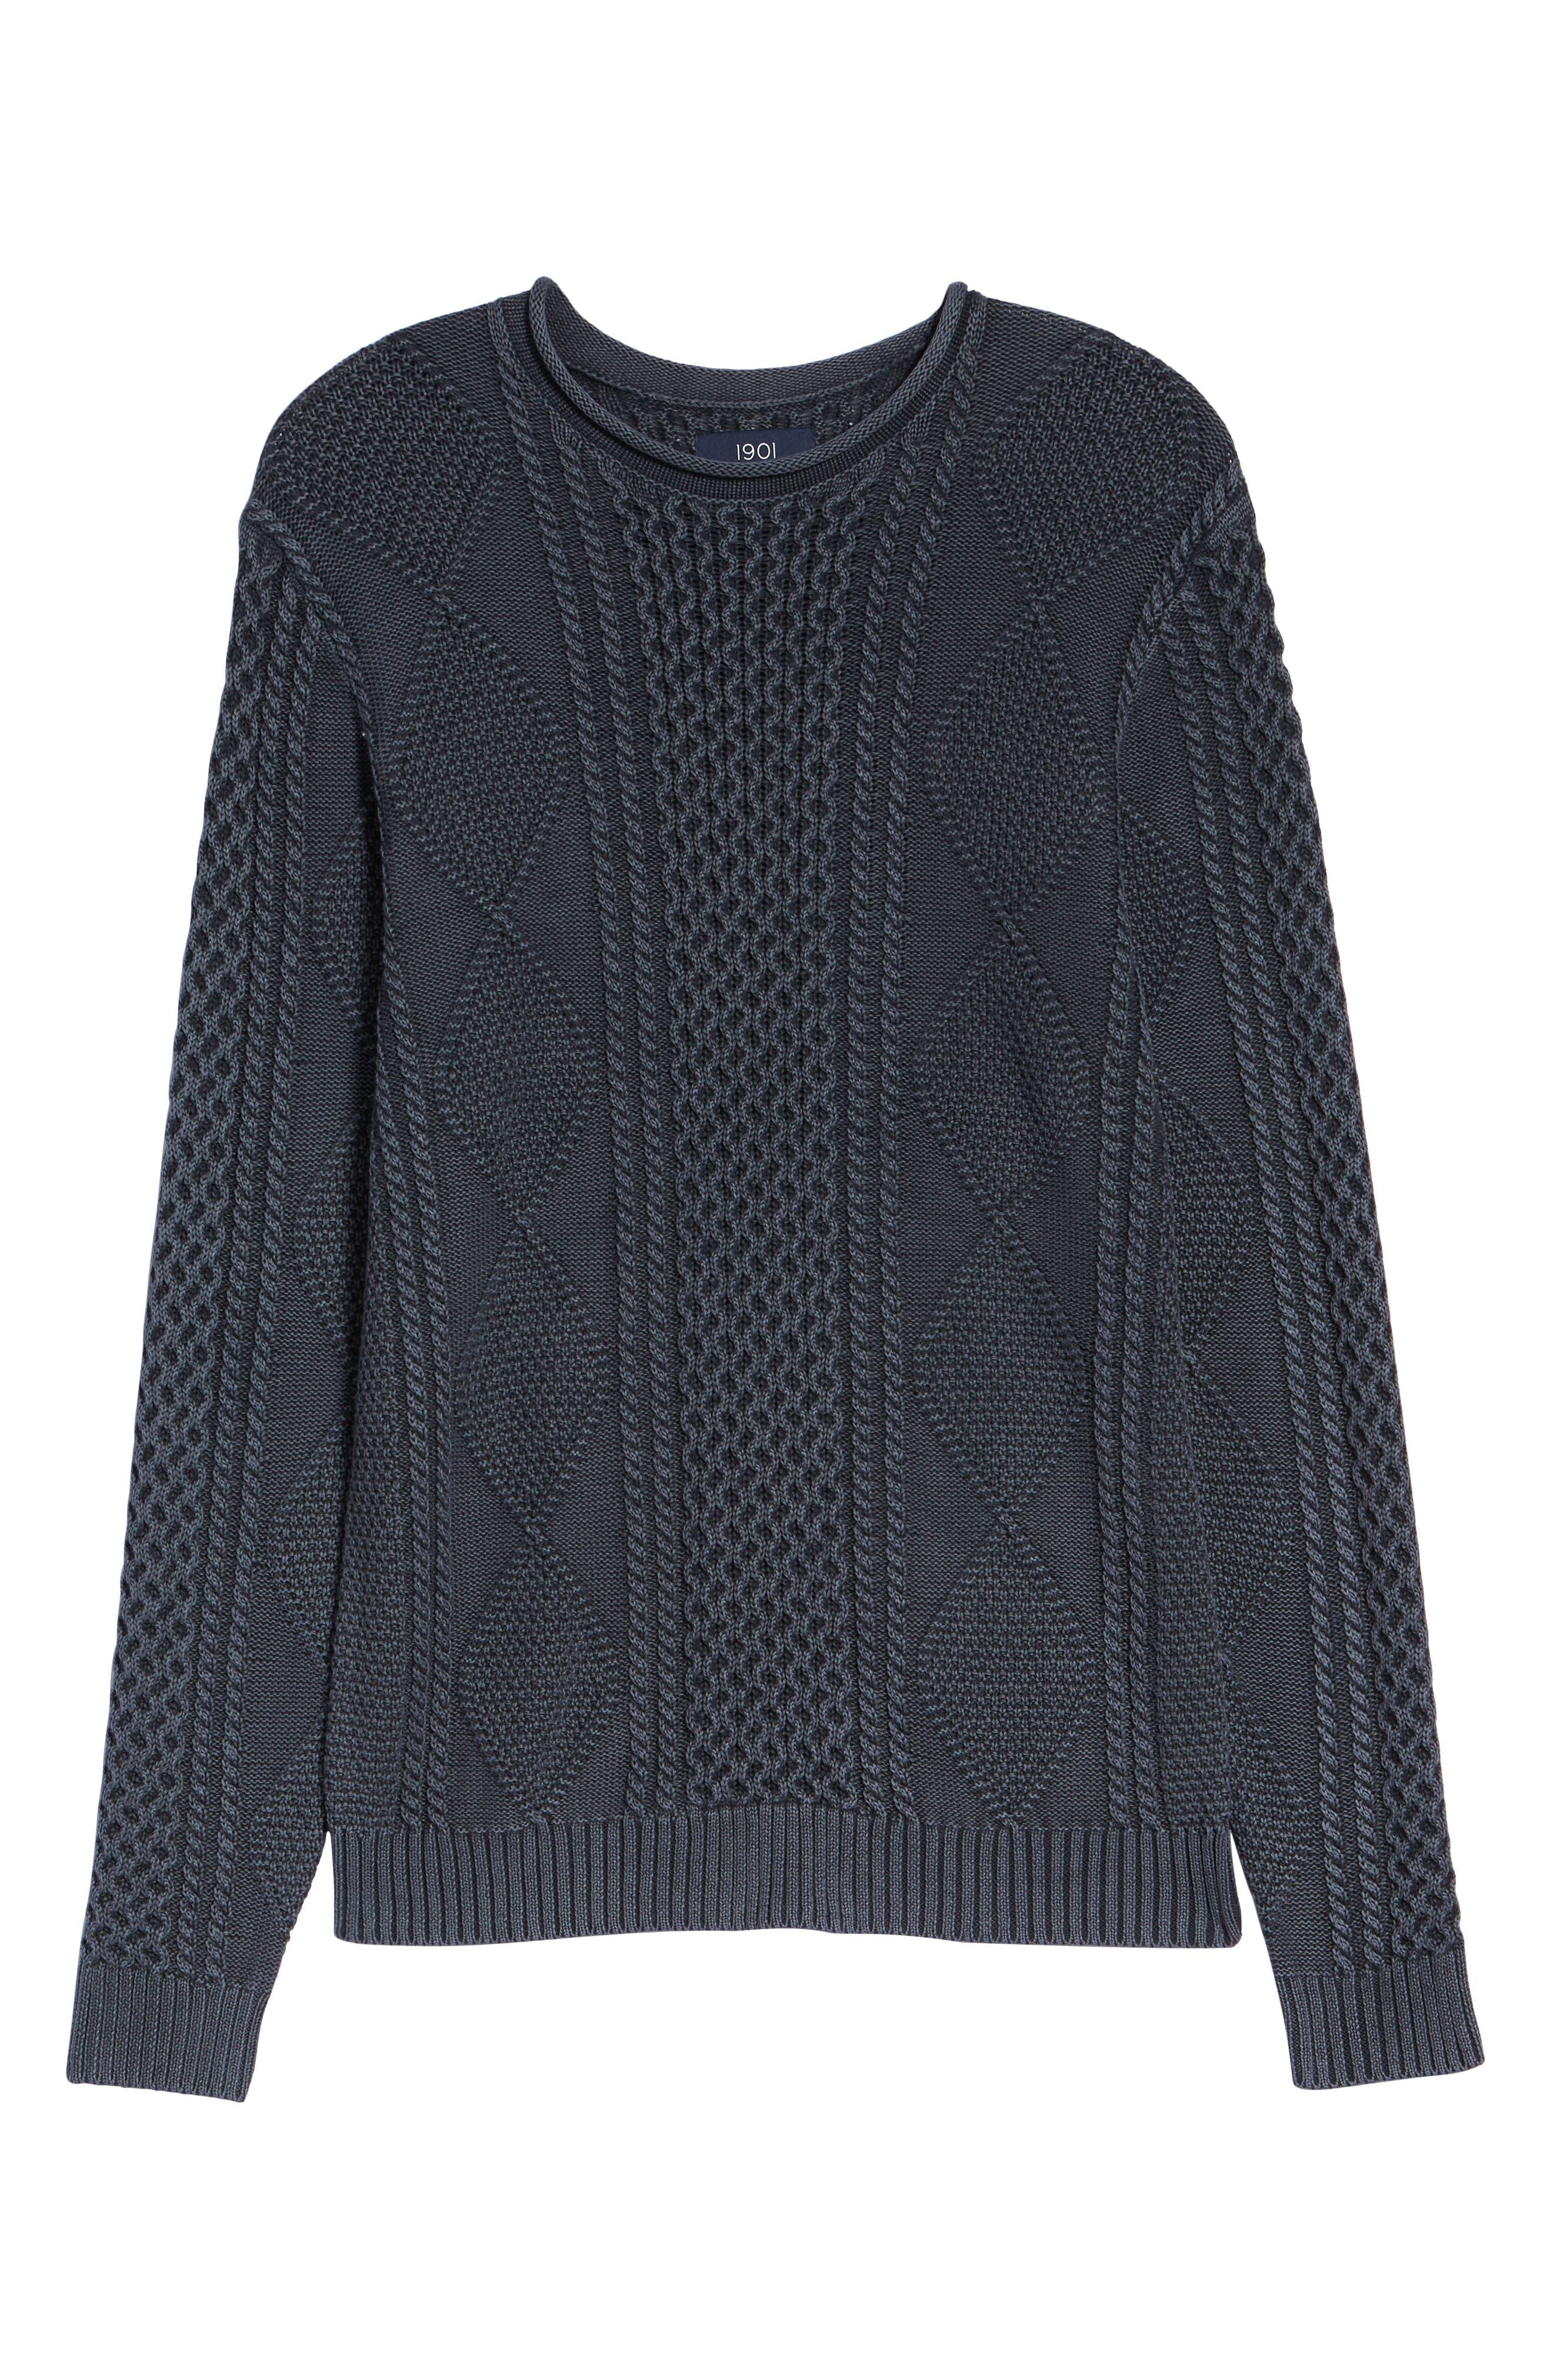 Fisherman Sweater,                             Alternate thumbnail 6, color,                             NAVY IRIS